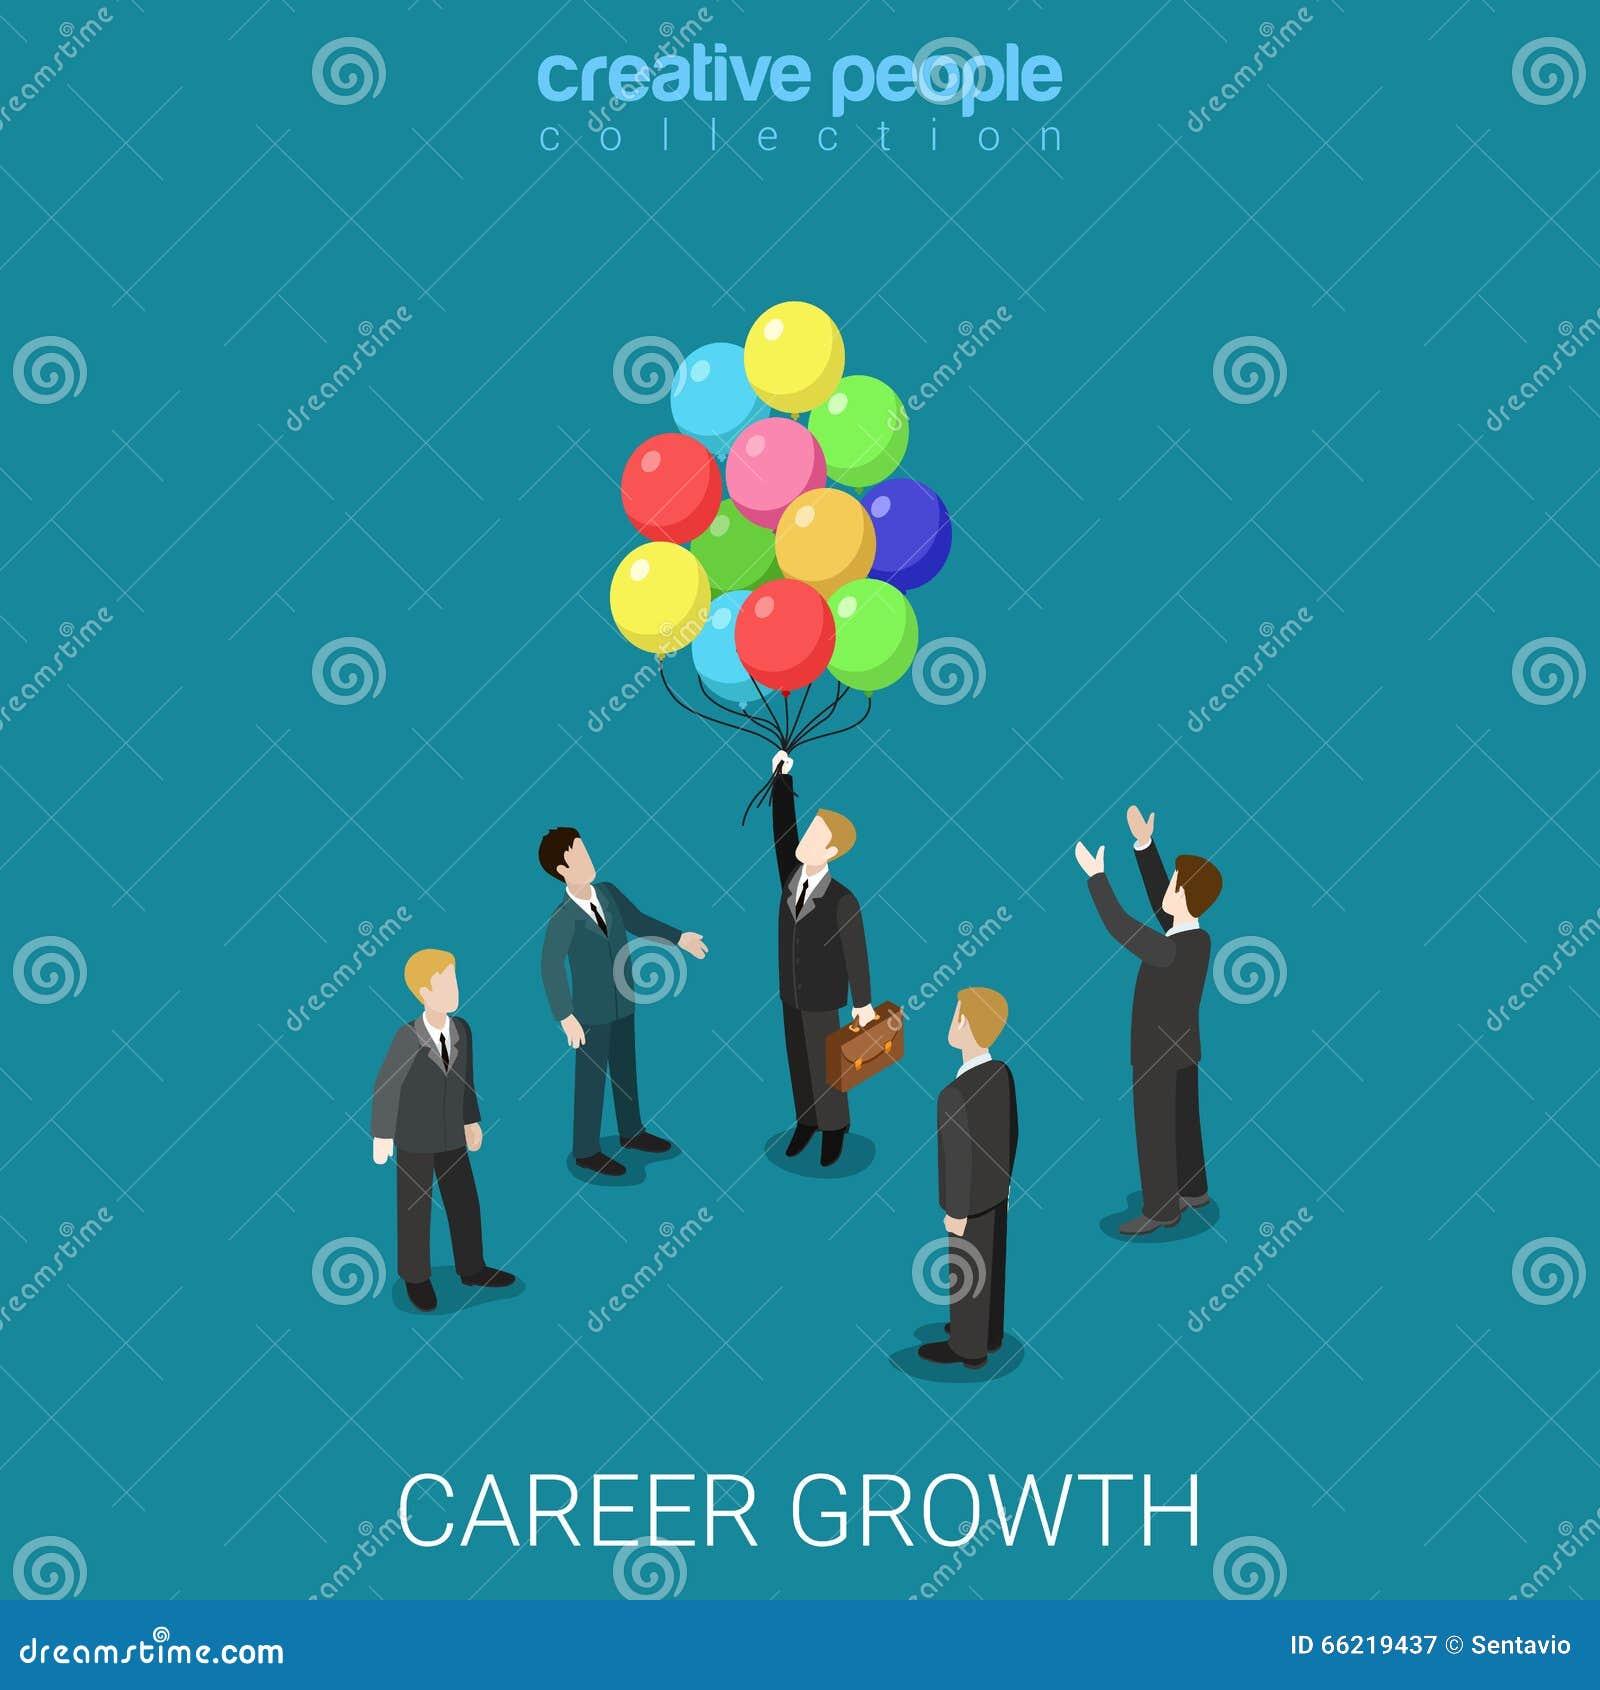 Career Growth Job Change Headhunting Flat Isometric Vector 3d ...